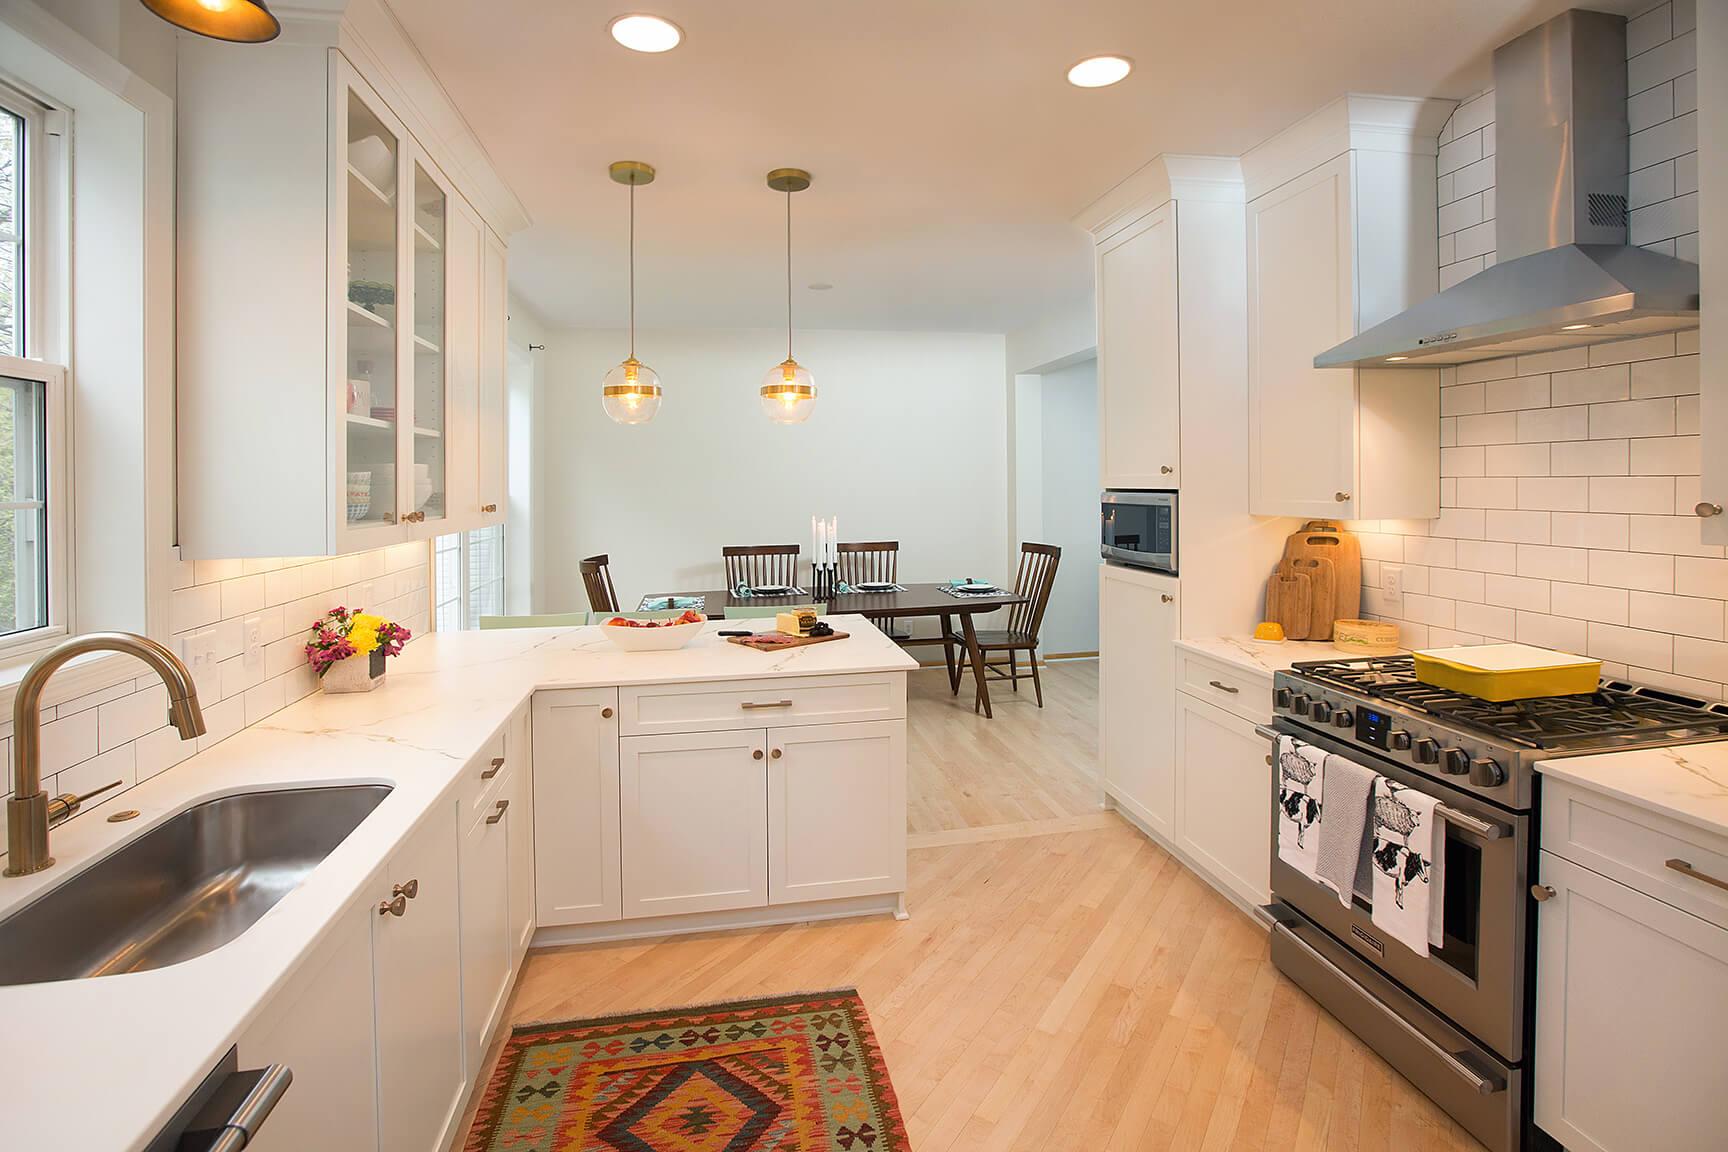 Artisan Kitchen Design 0004_edit